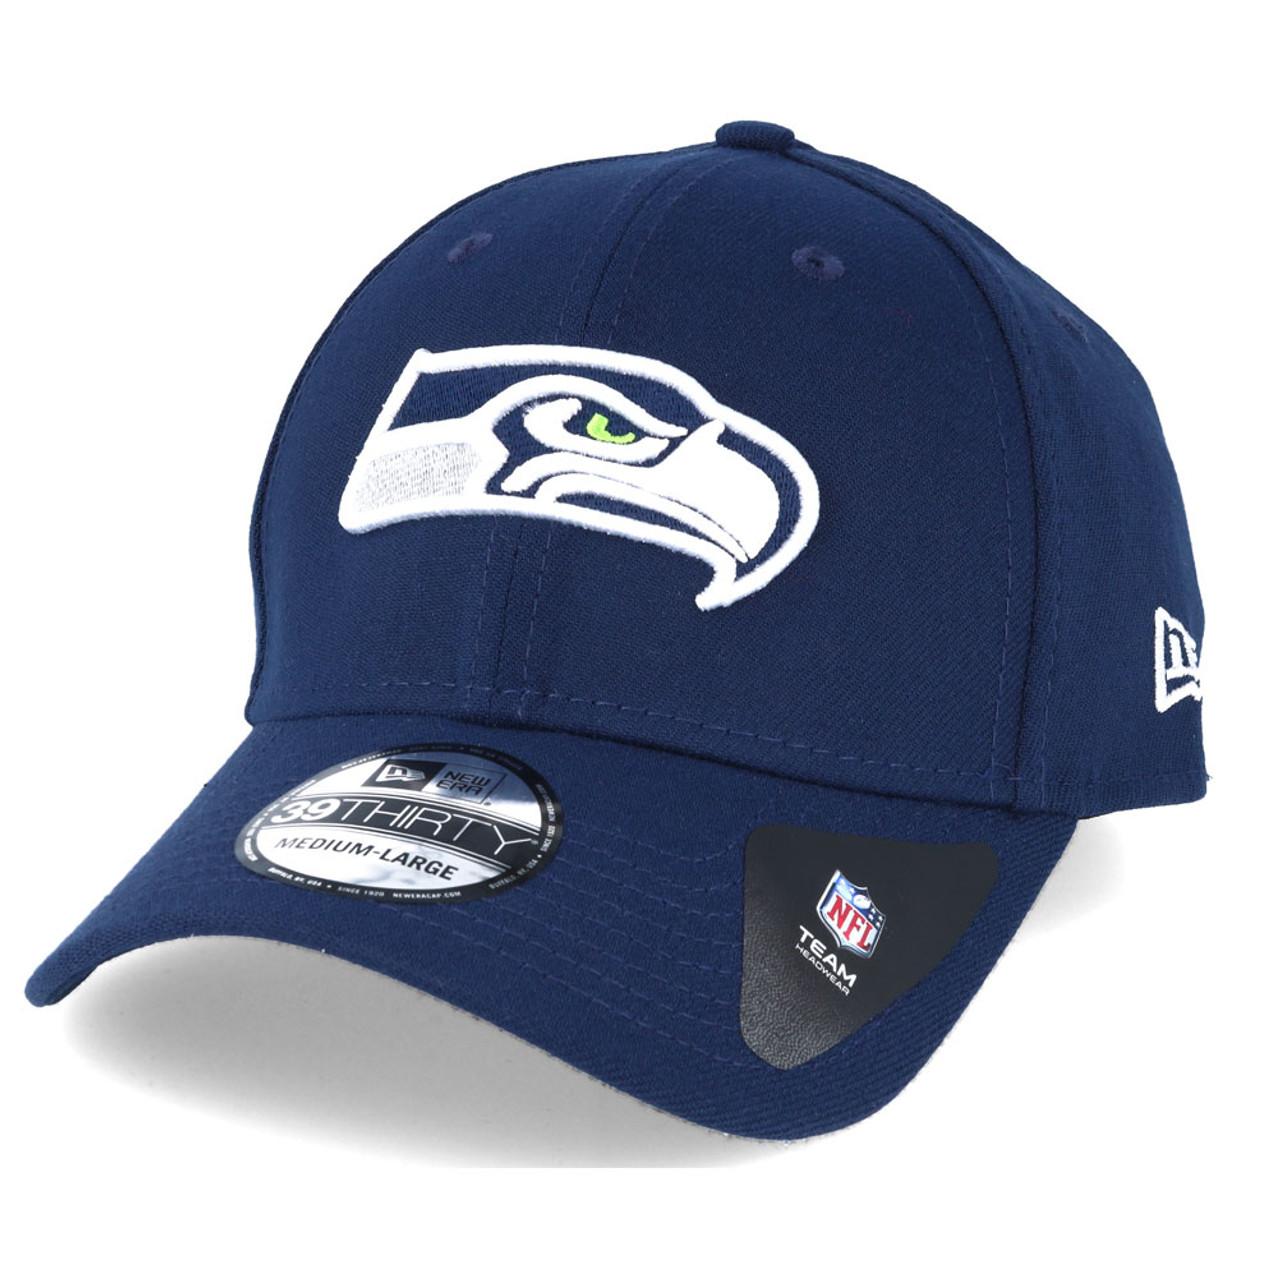 NEW ERA seattle seahawks 39thirty fitted american football cap  navy  3ec167ffe